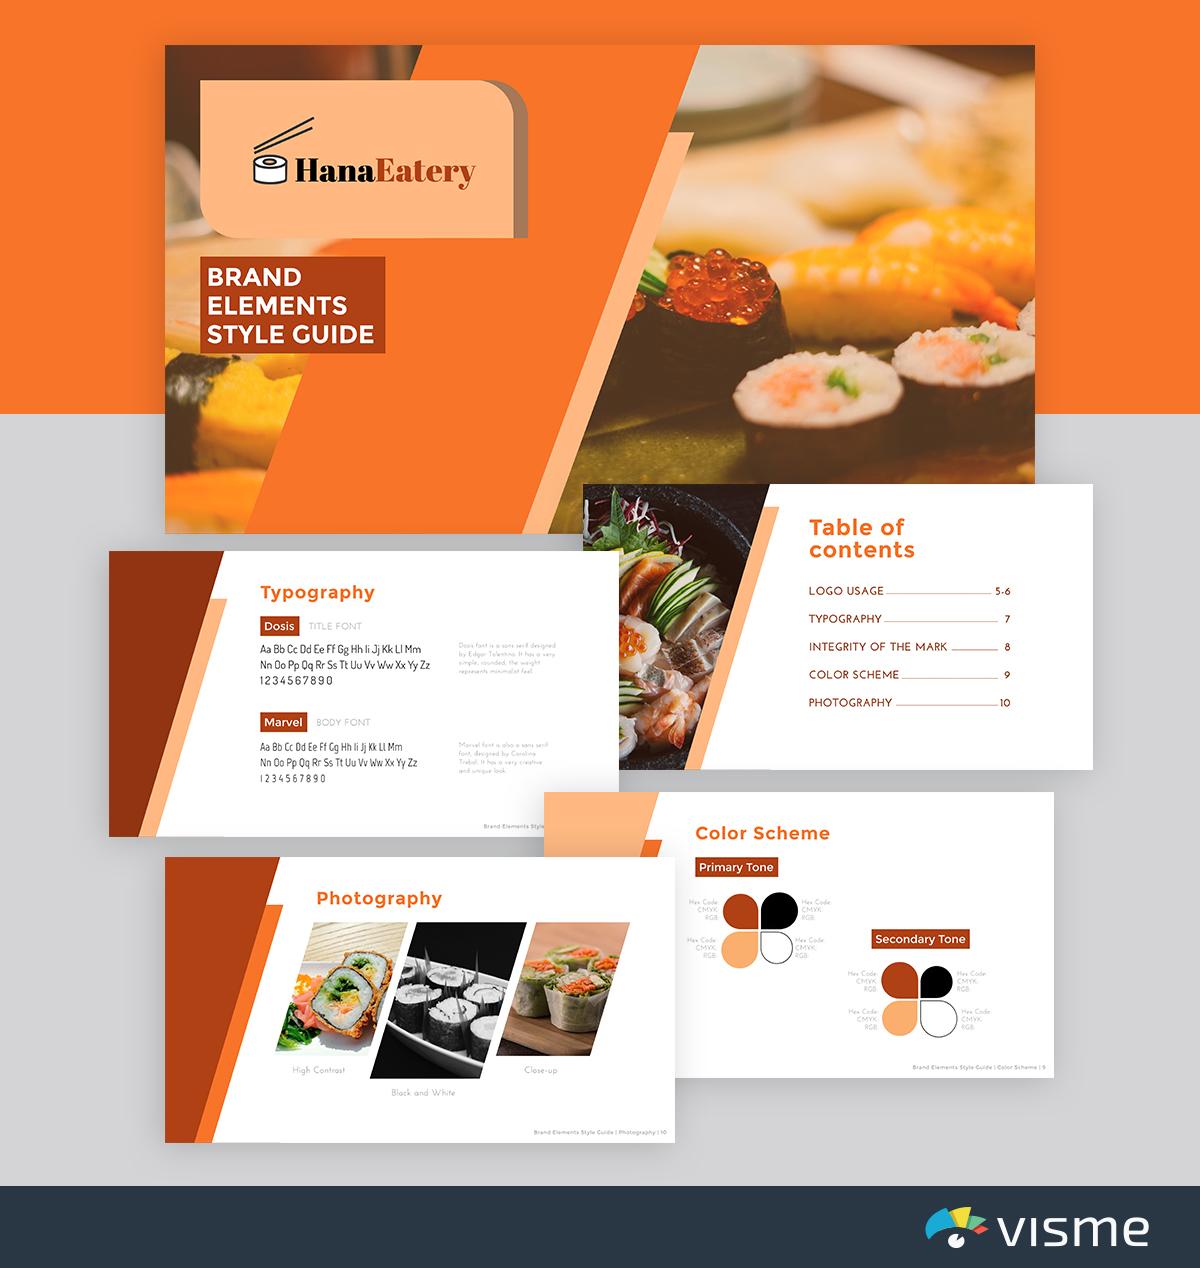 best presentation templates - Restaurant-brand-identity-visme